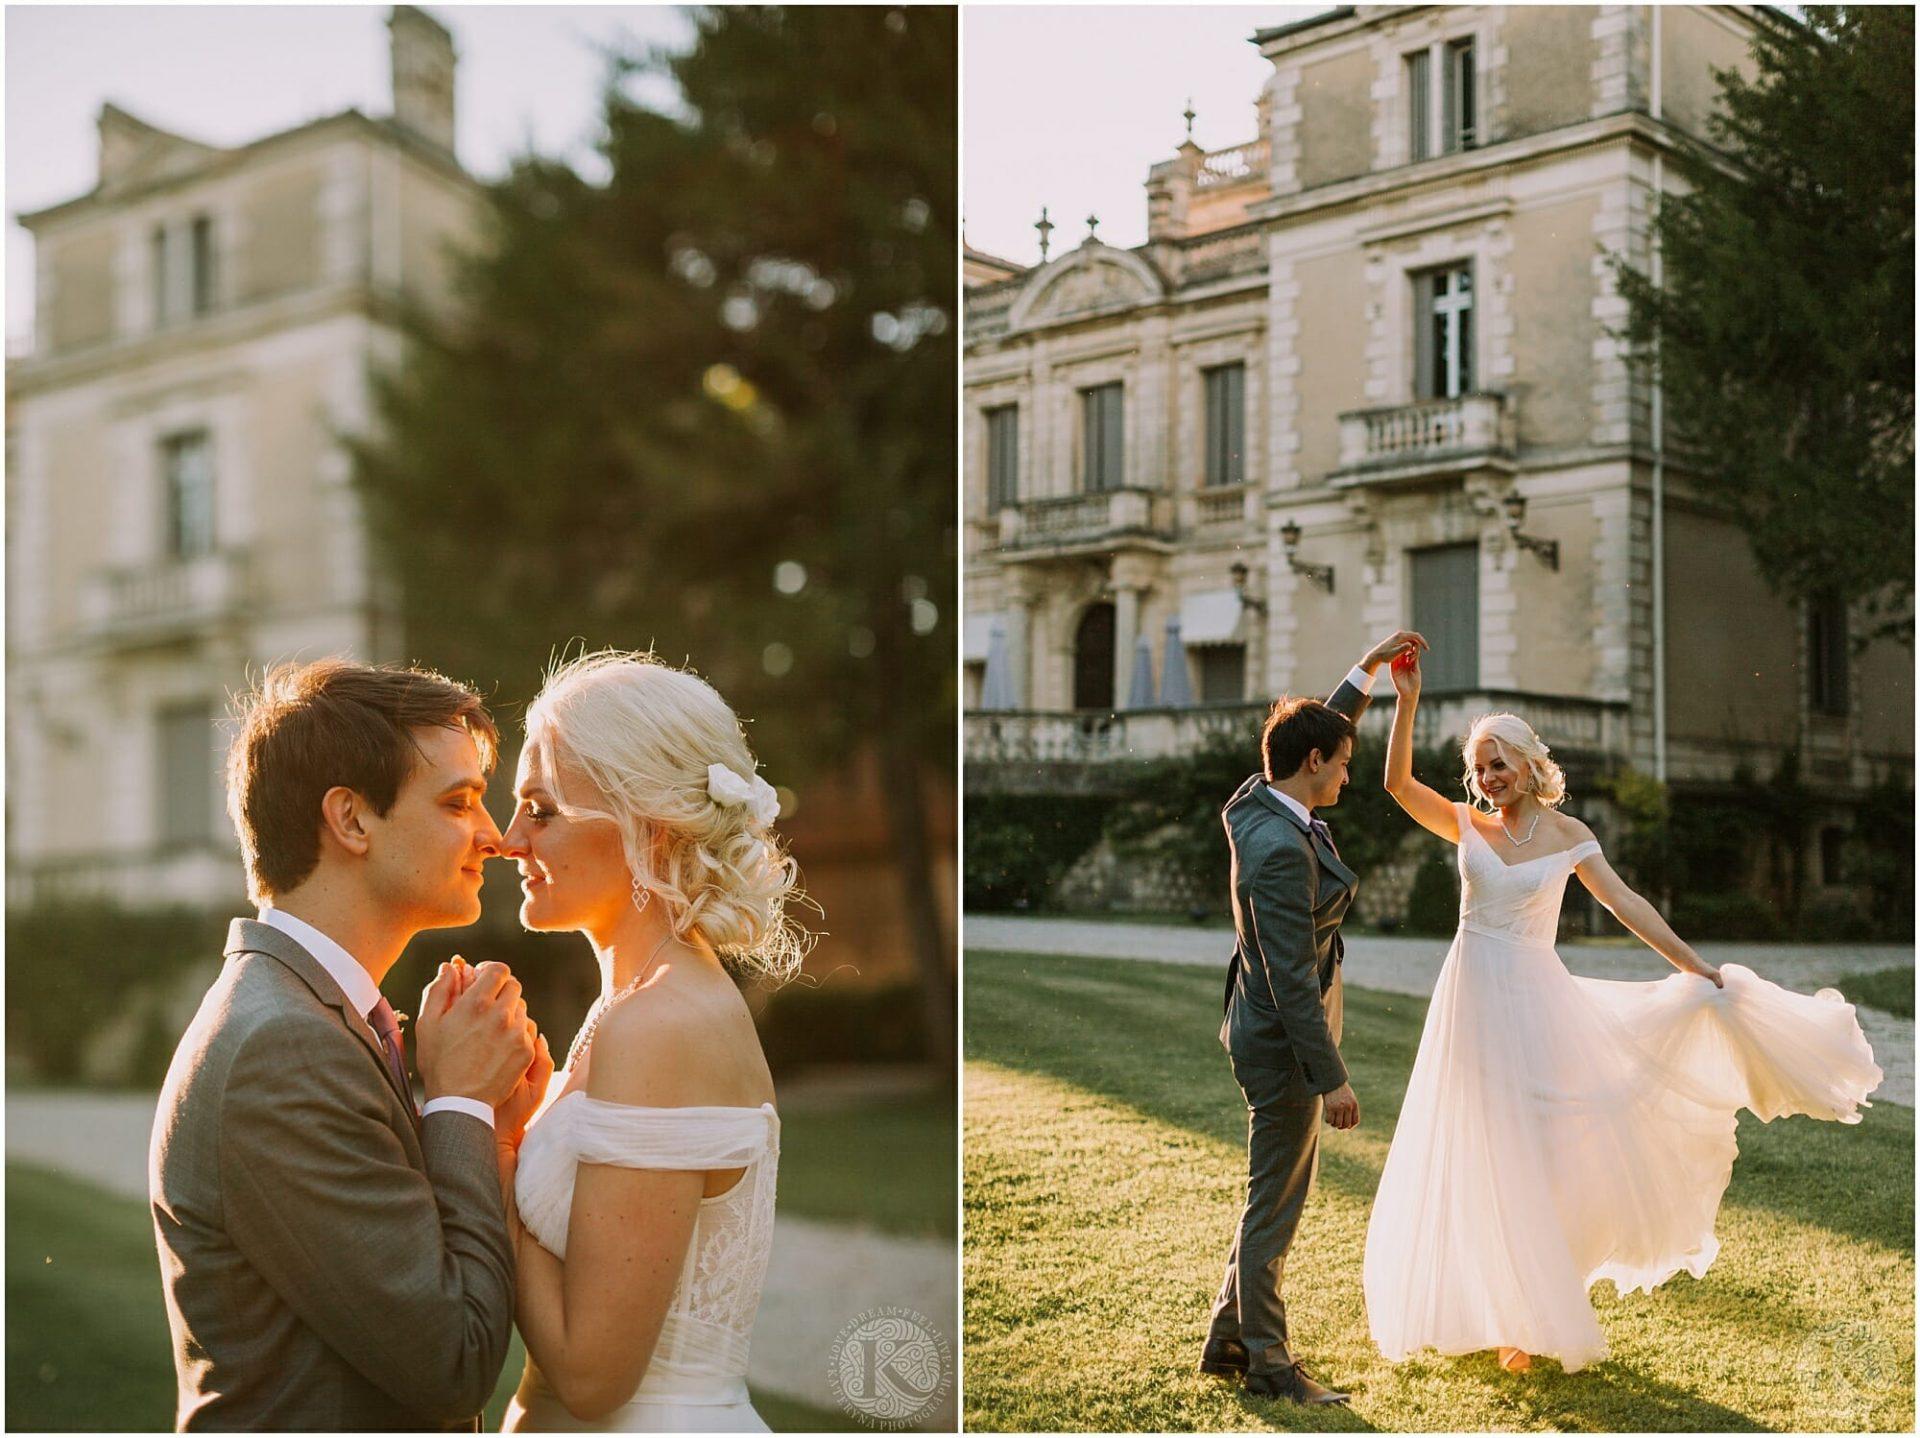 Kateryna-photos-photographe-mariage-chateau-des-3-fontaines-provence-avignon-vaucluse-sud_0099.jpg